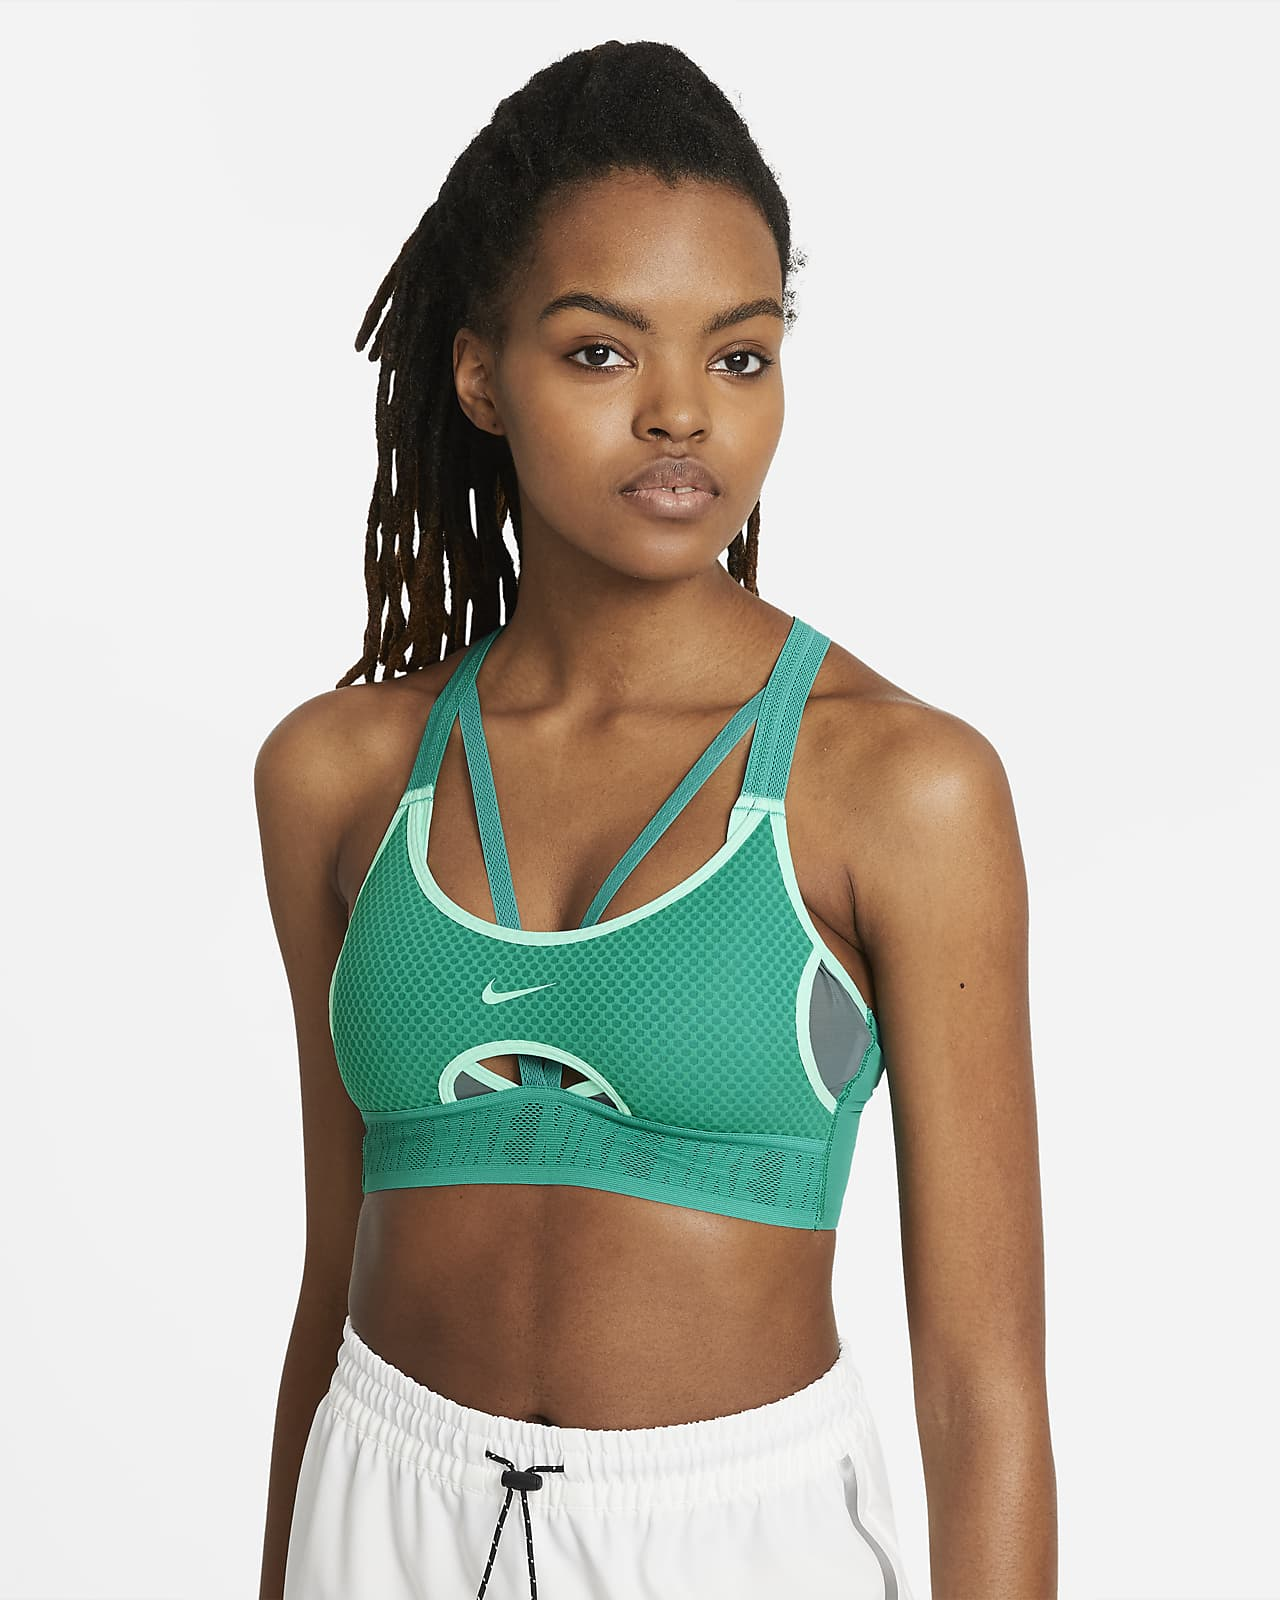 Nike Indy UltraBreathe Women's Light-Support Sports Bra